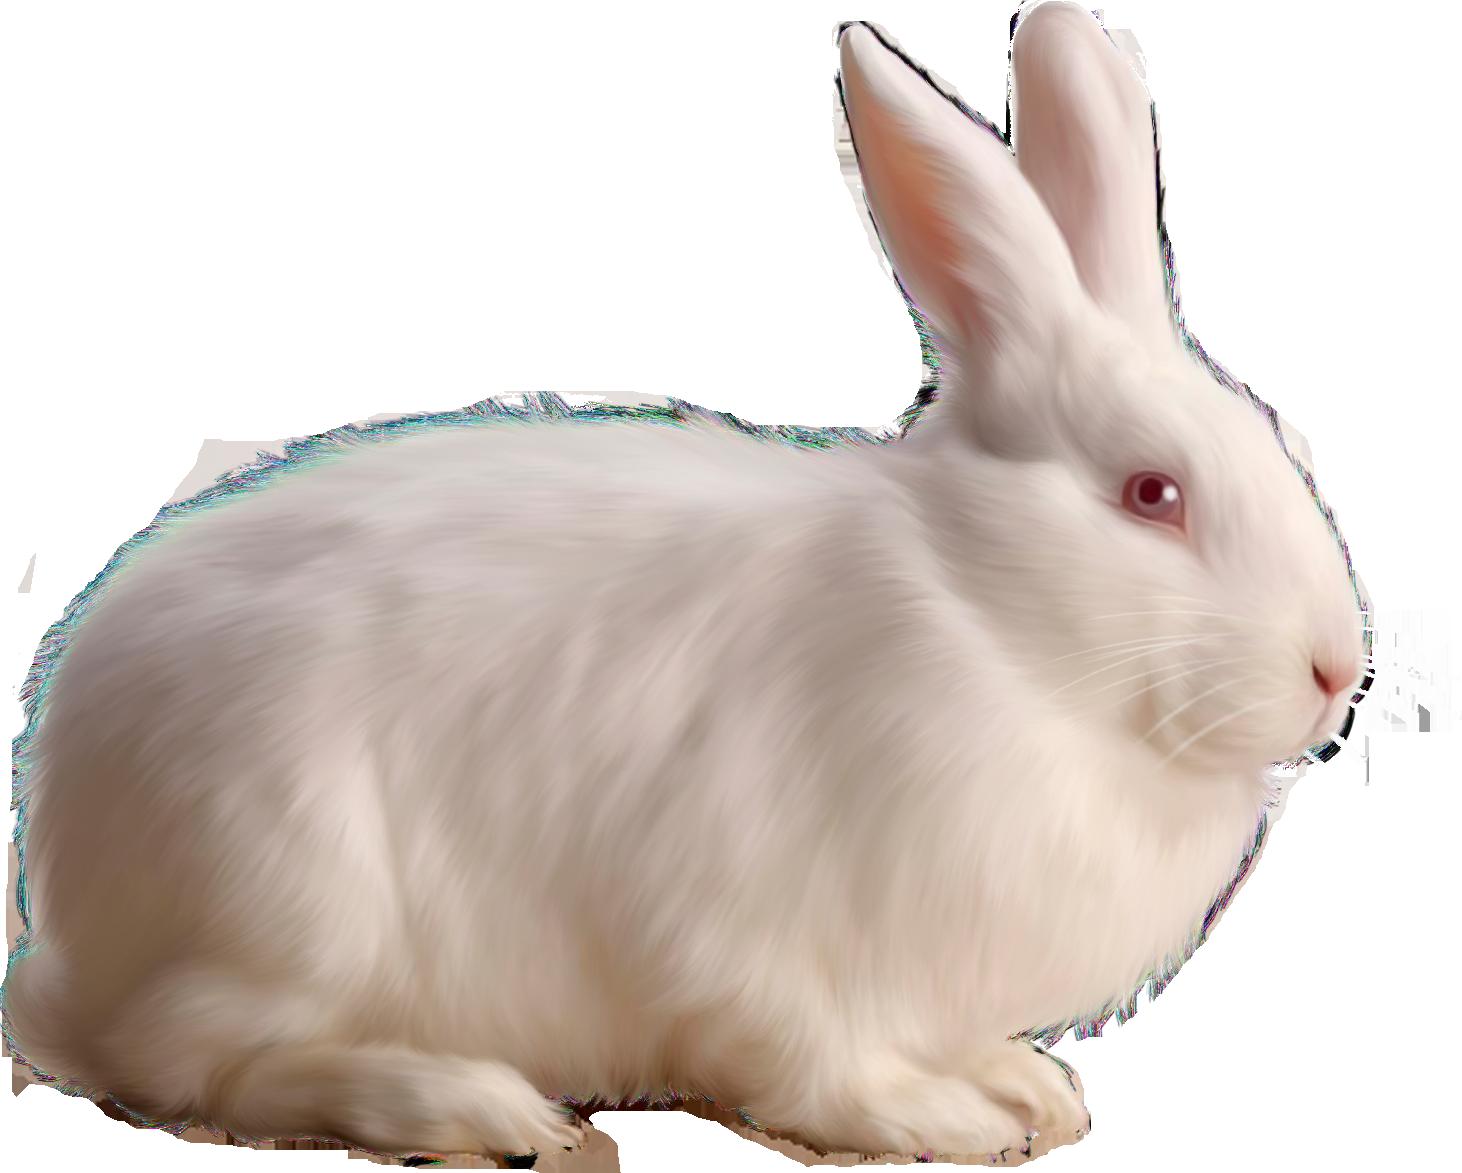 Rabbit Free Png Image.png (1462×1173) - Rabbit, Transparent background PNG HD thumbnail